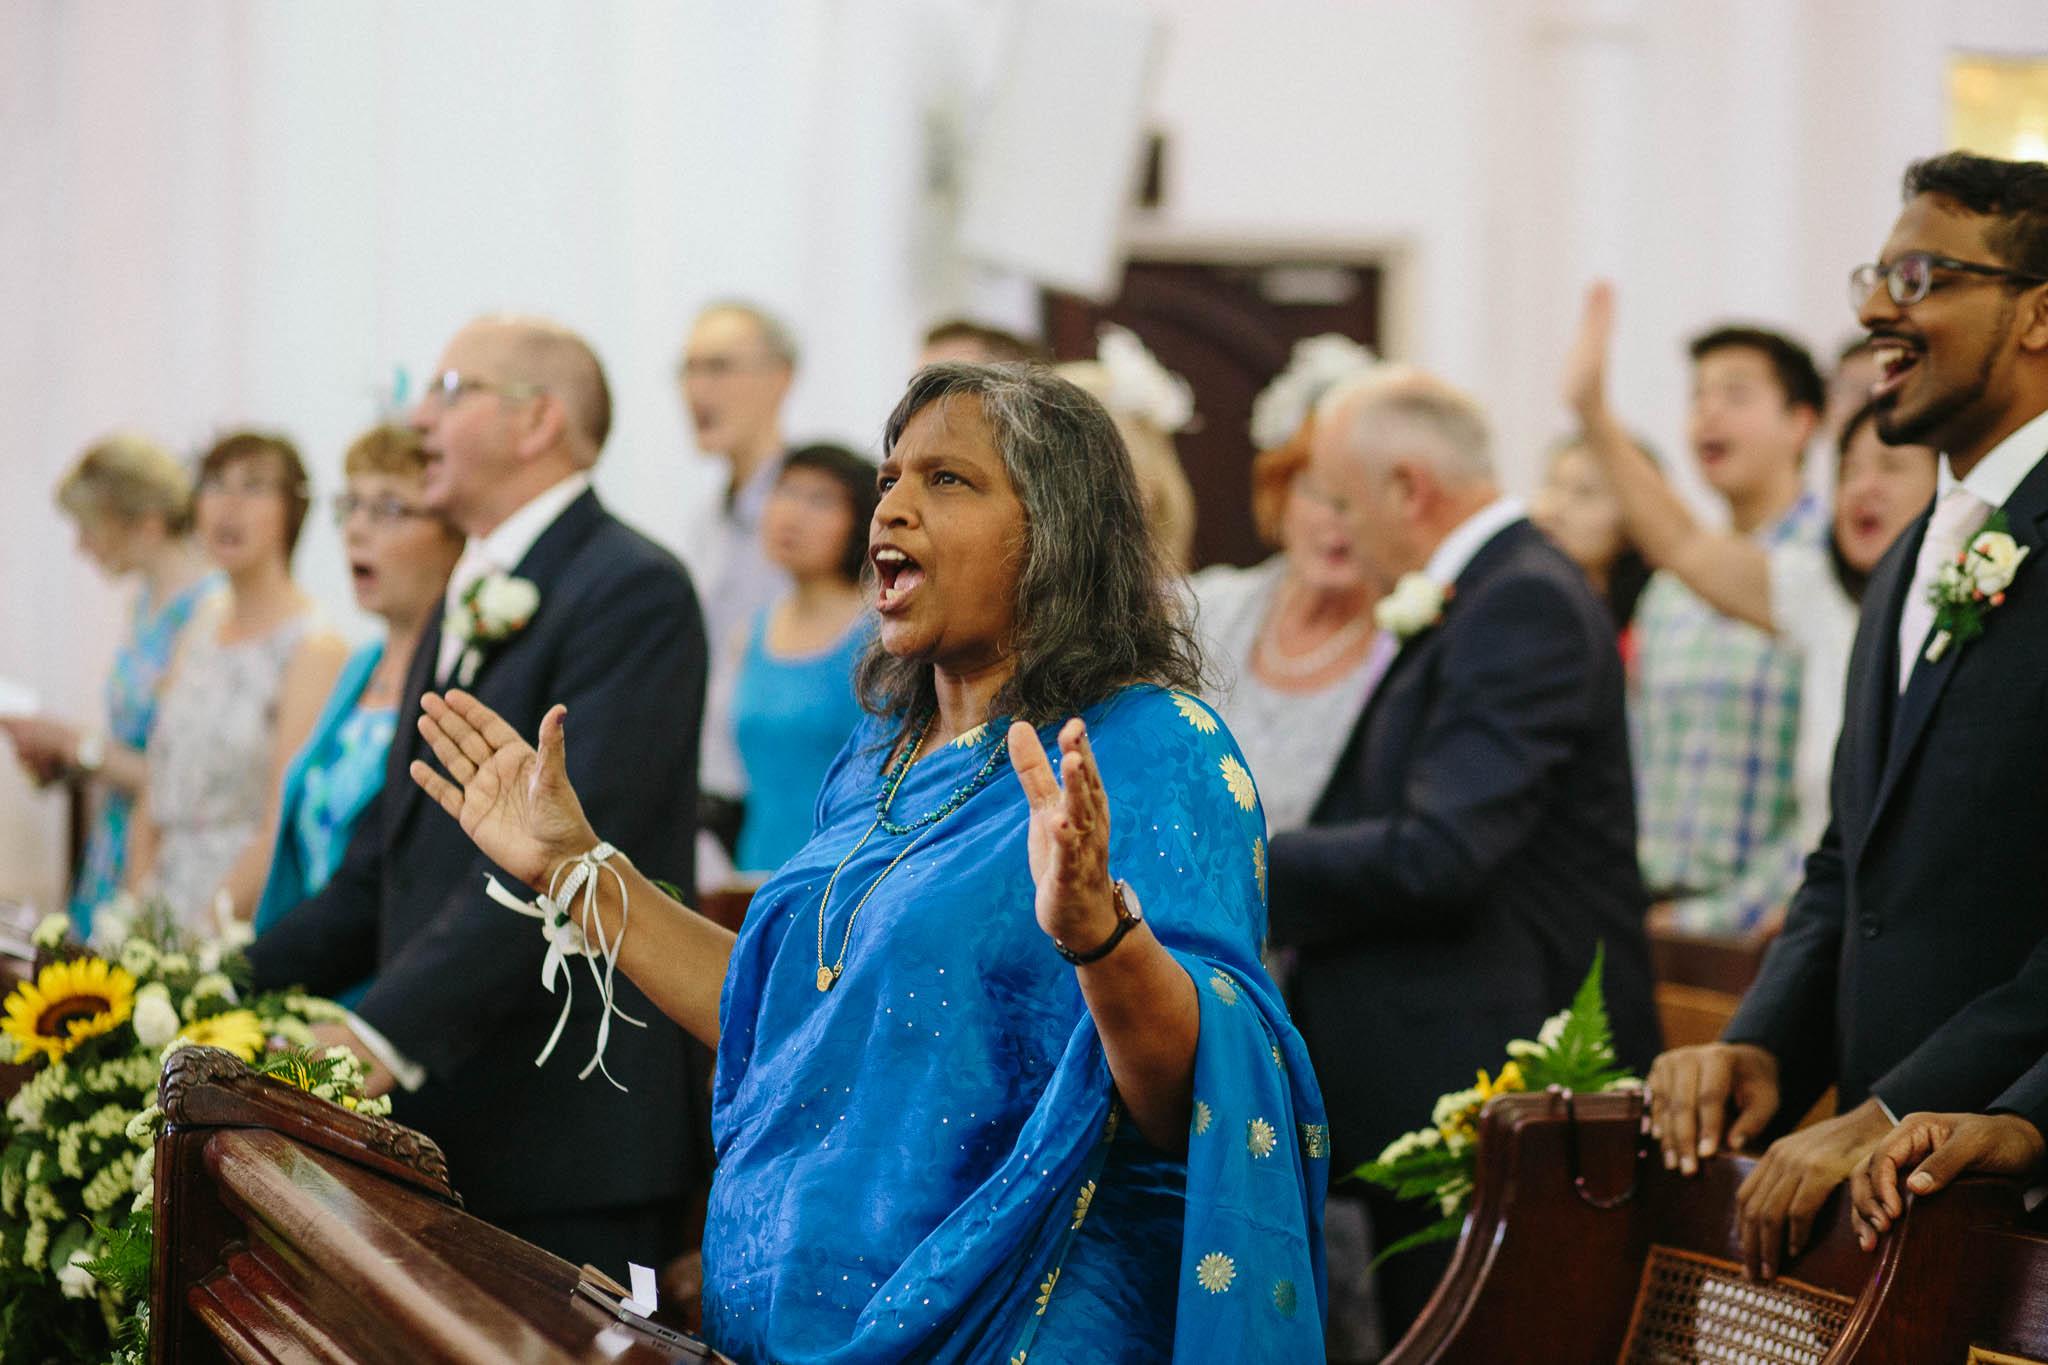 singapore-wedding-photographer-st-andrews-cathedral-renita-david-11.jpg